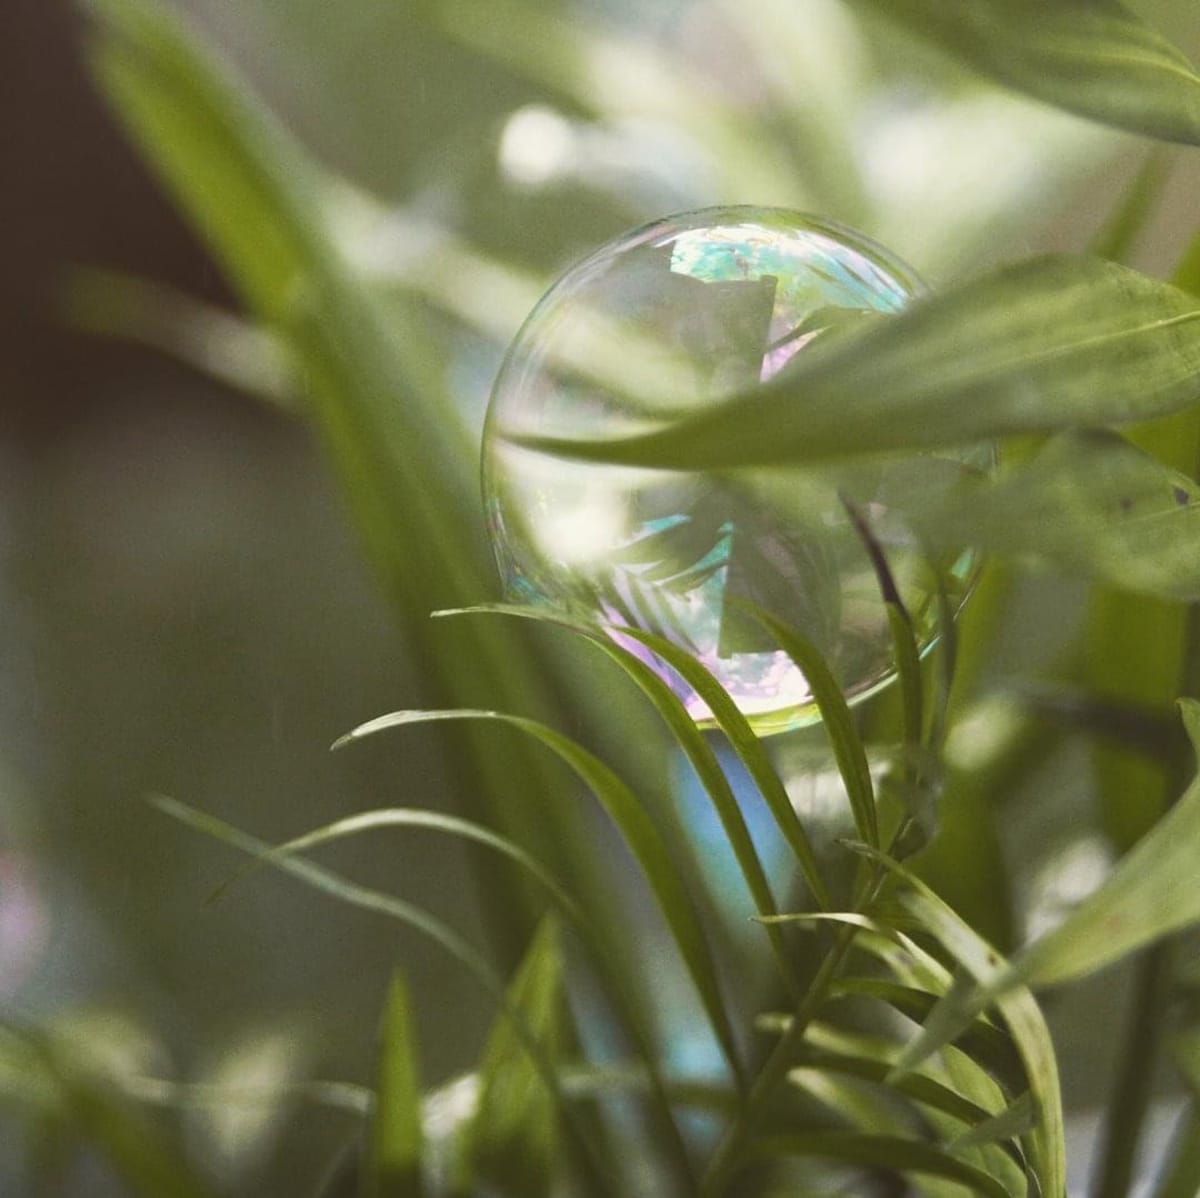 Palm Holding a Bubble by Sarah Flores